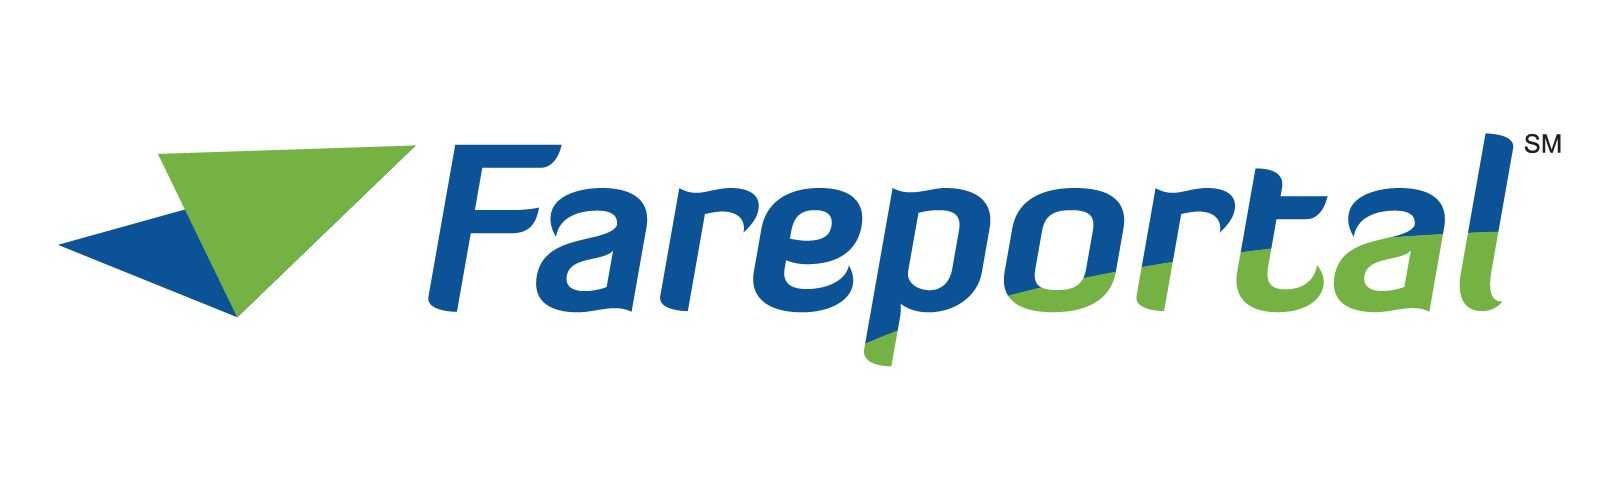 Fareportal